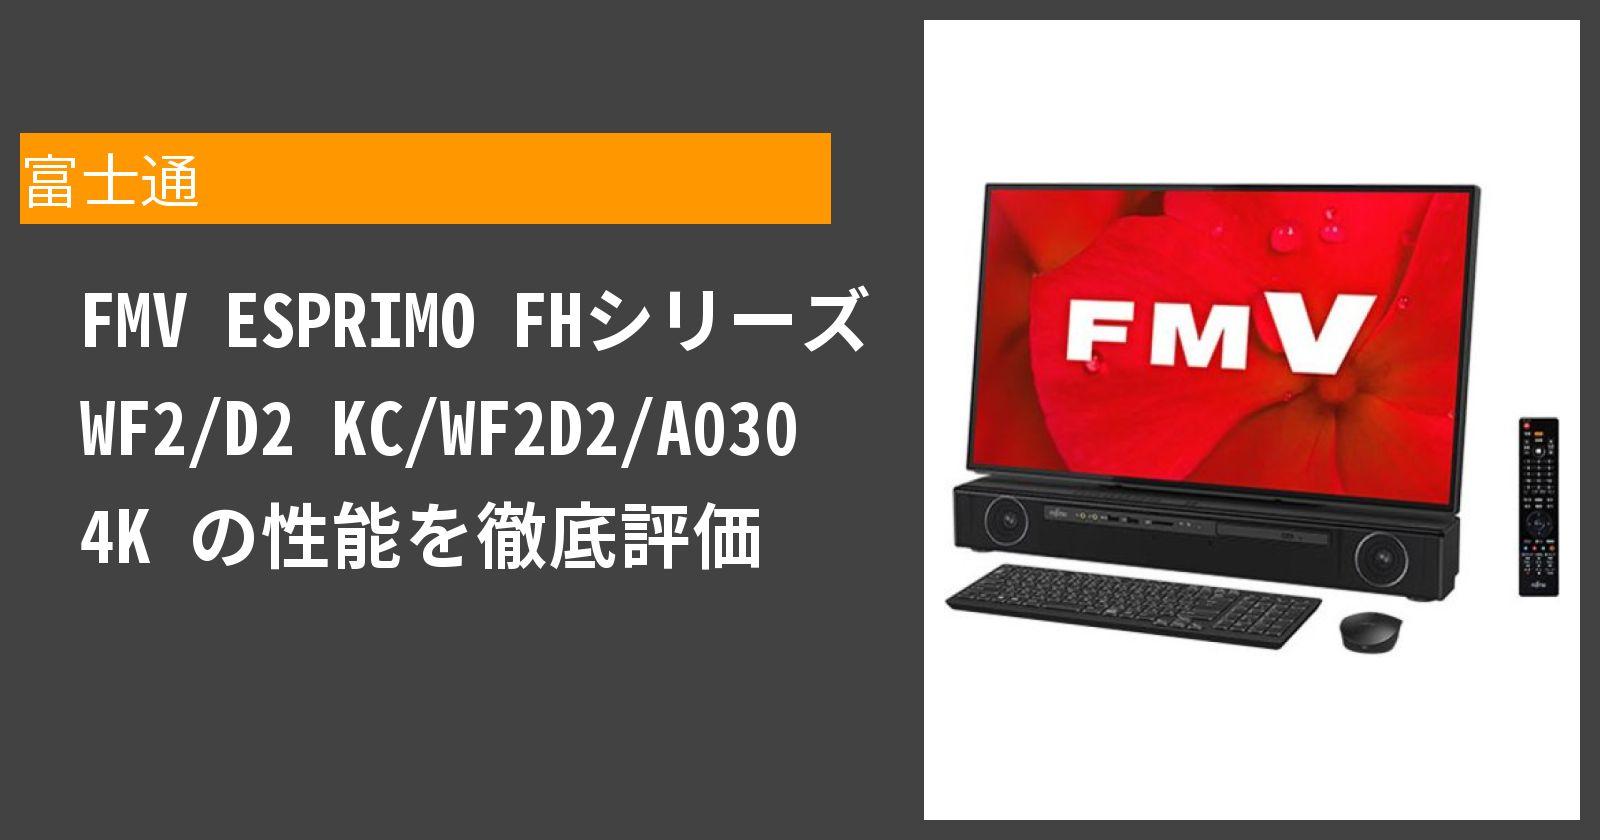 FMV ESPRIMO FHシリーズ WF2/D2 KC/WF2D2/A030 4K の性能を徹底評価